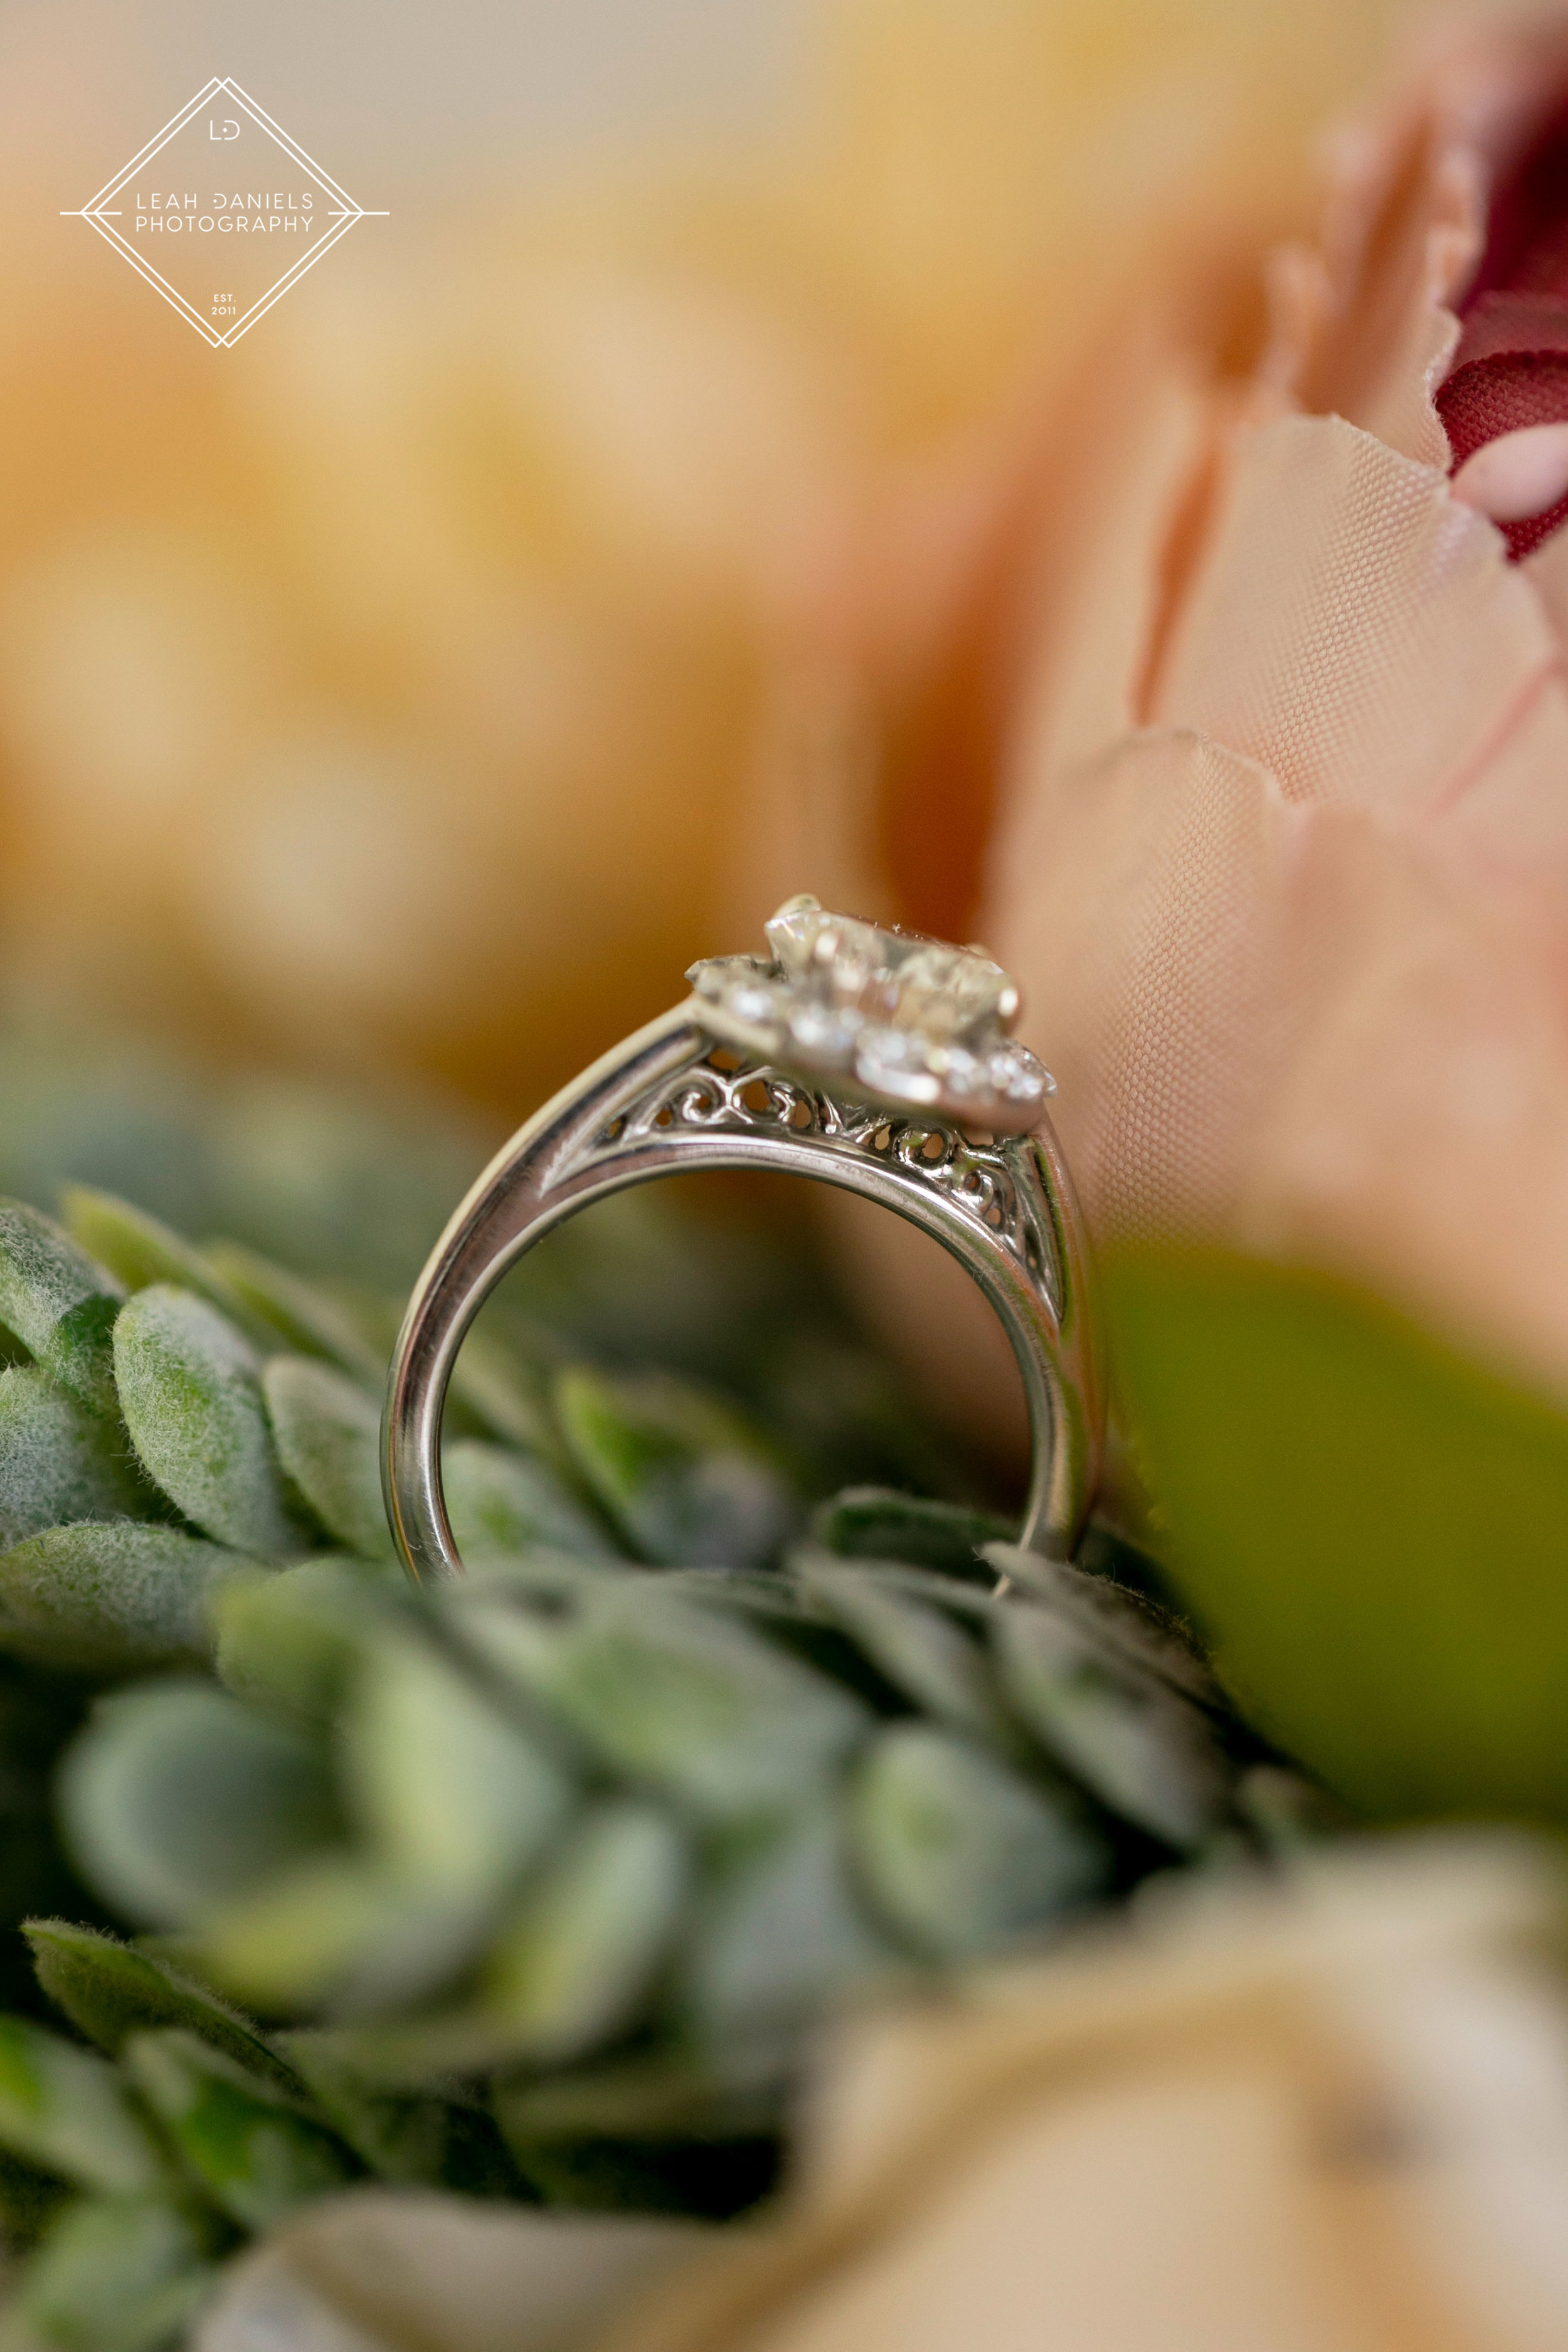 NOW Larimar Destination Wedding Photos; The Rings